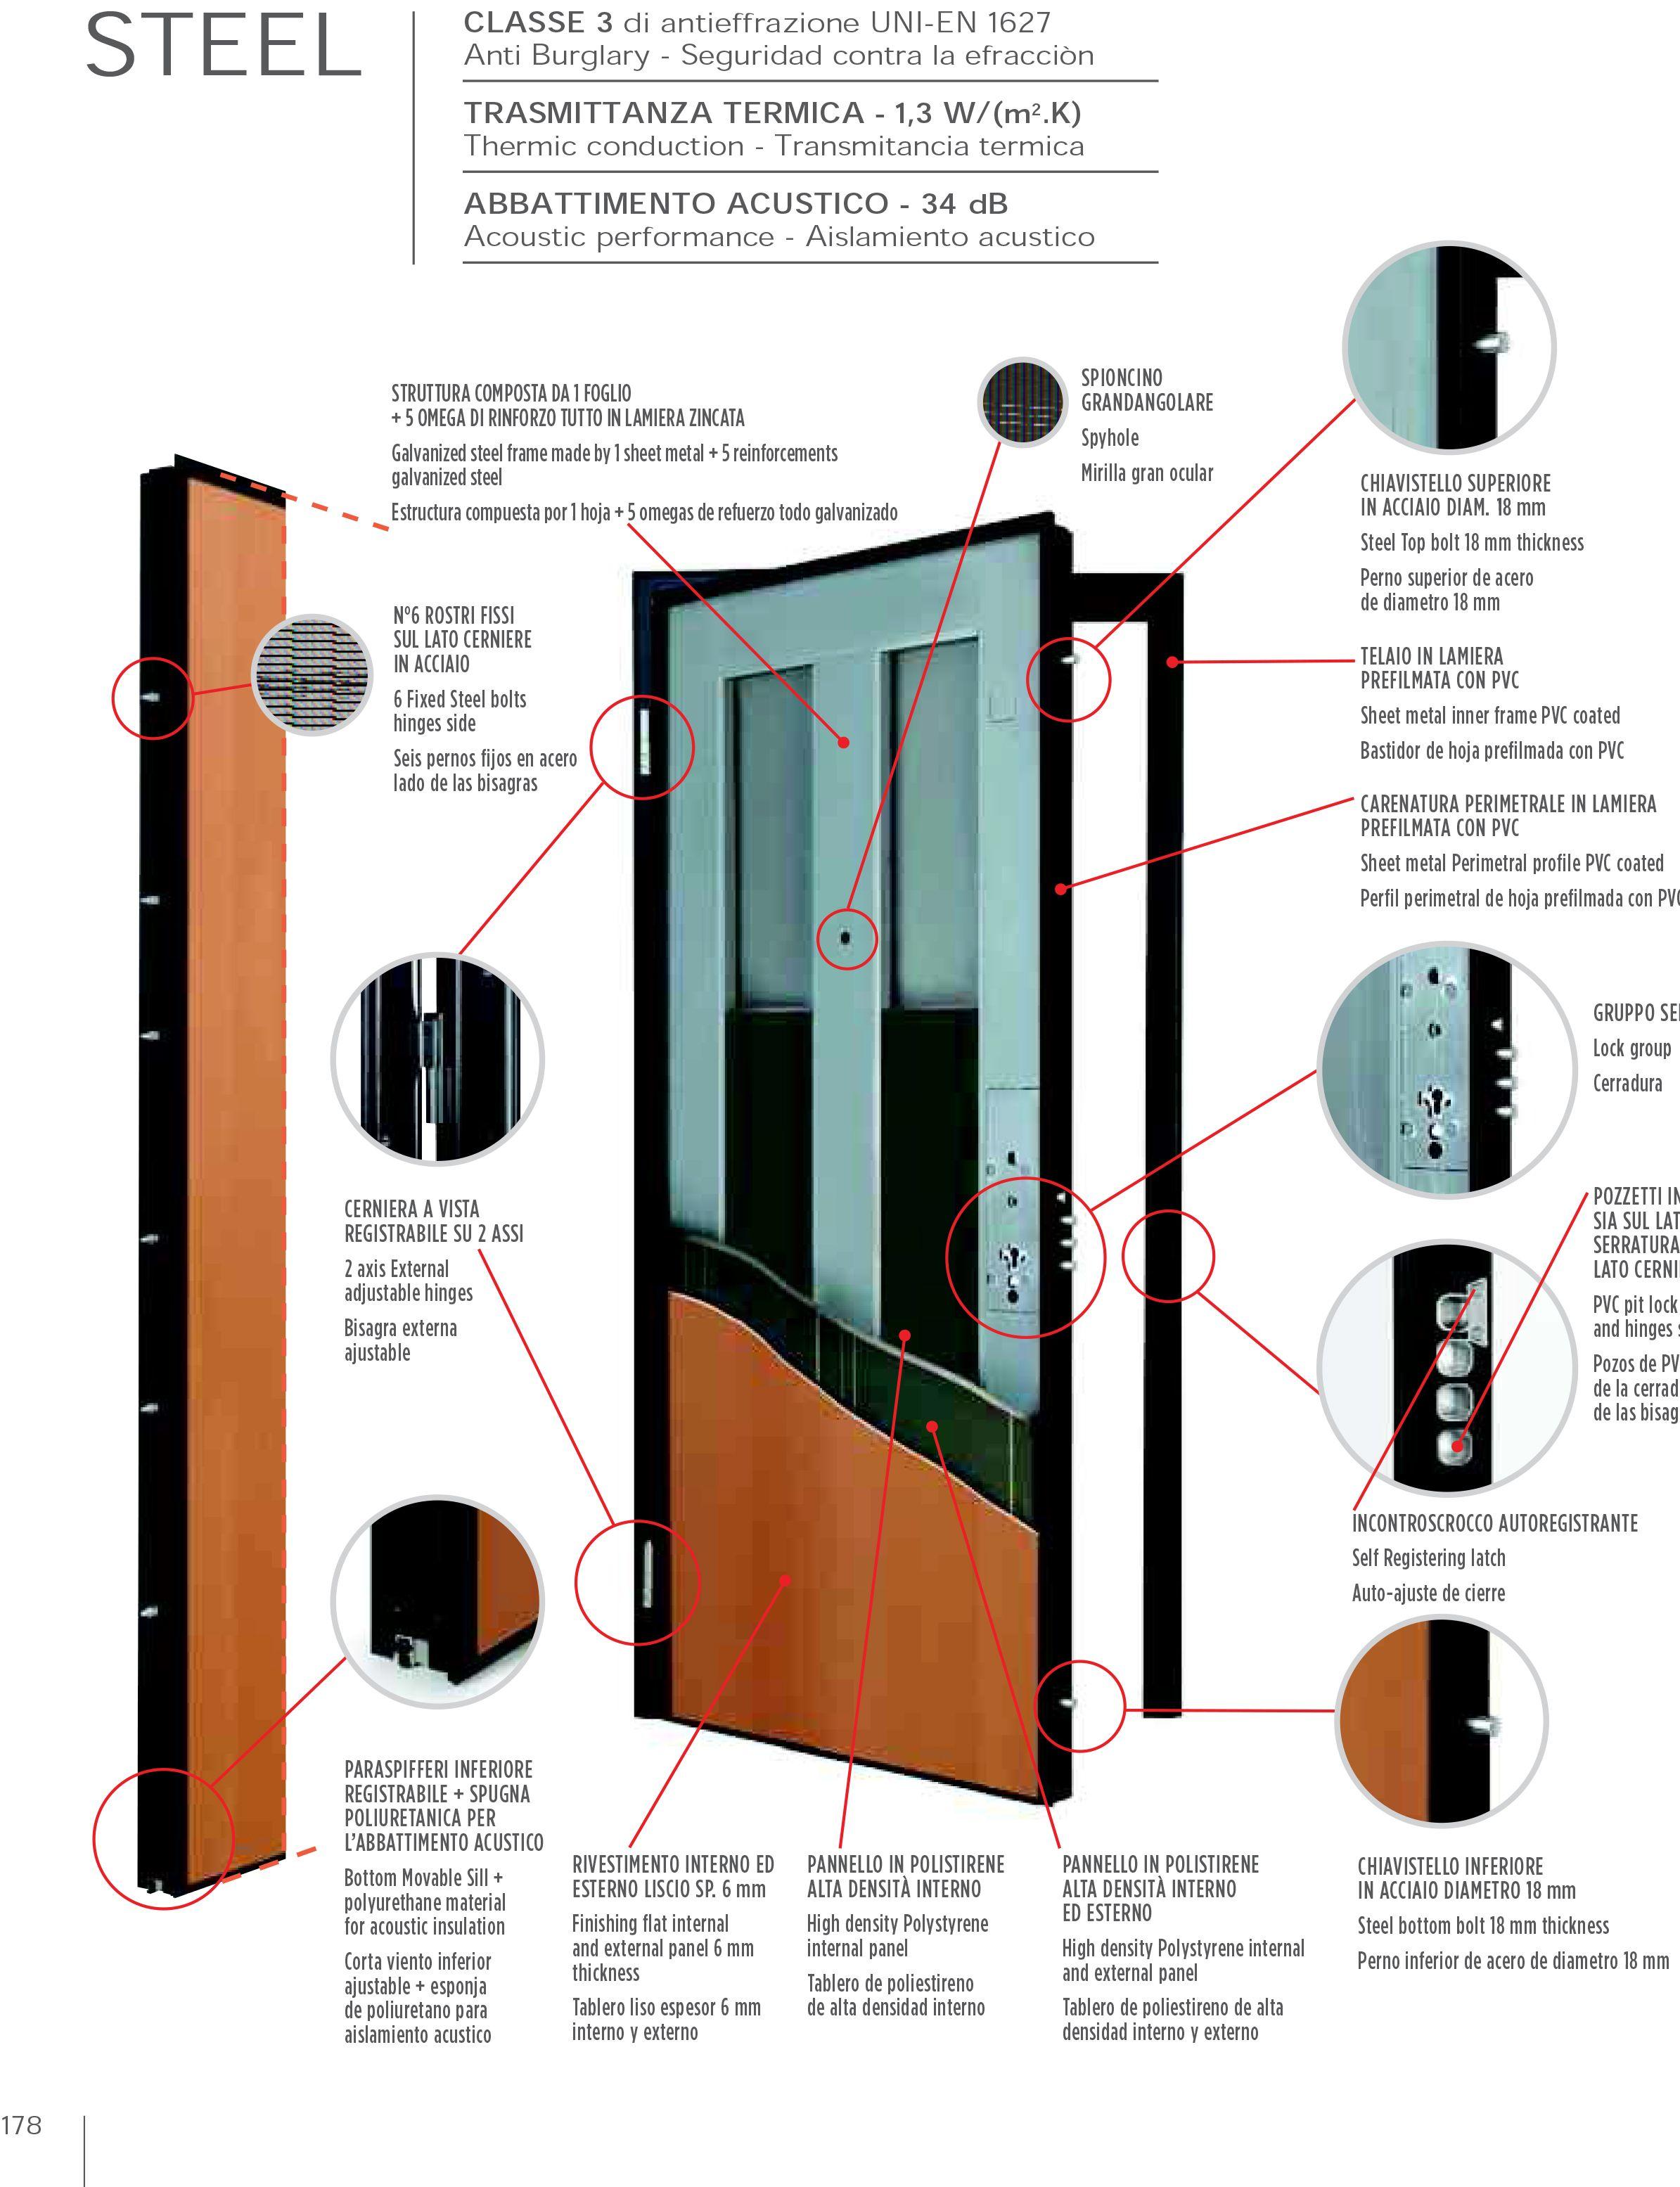 http://www.atresliving.it/venditainfissionline/alias-steel-porta ...